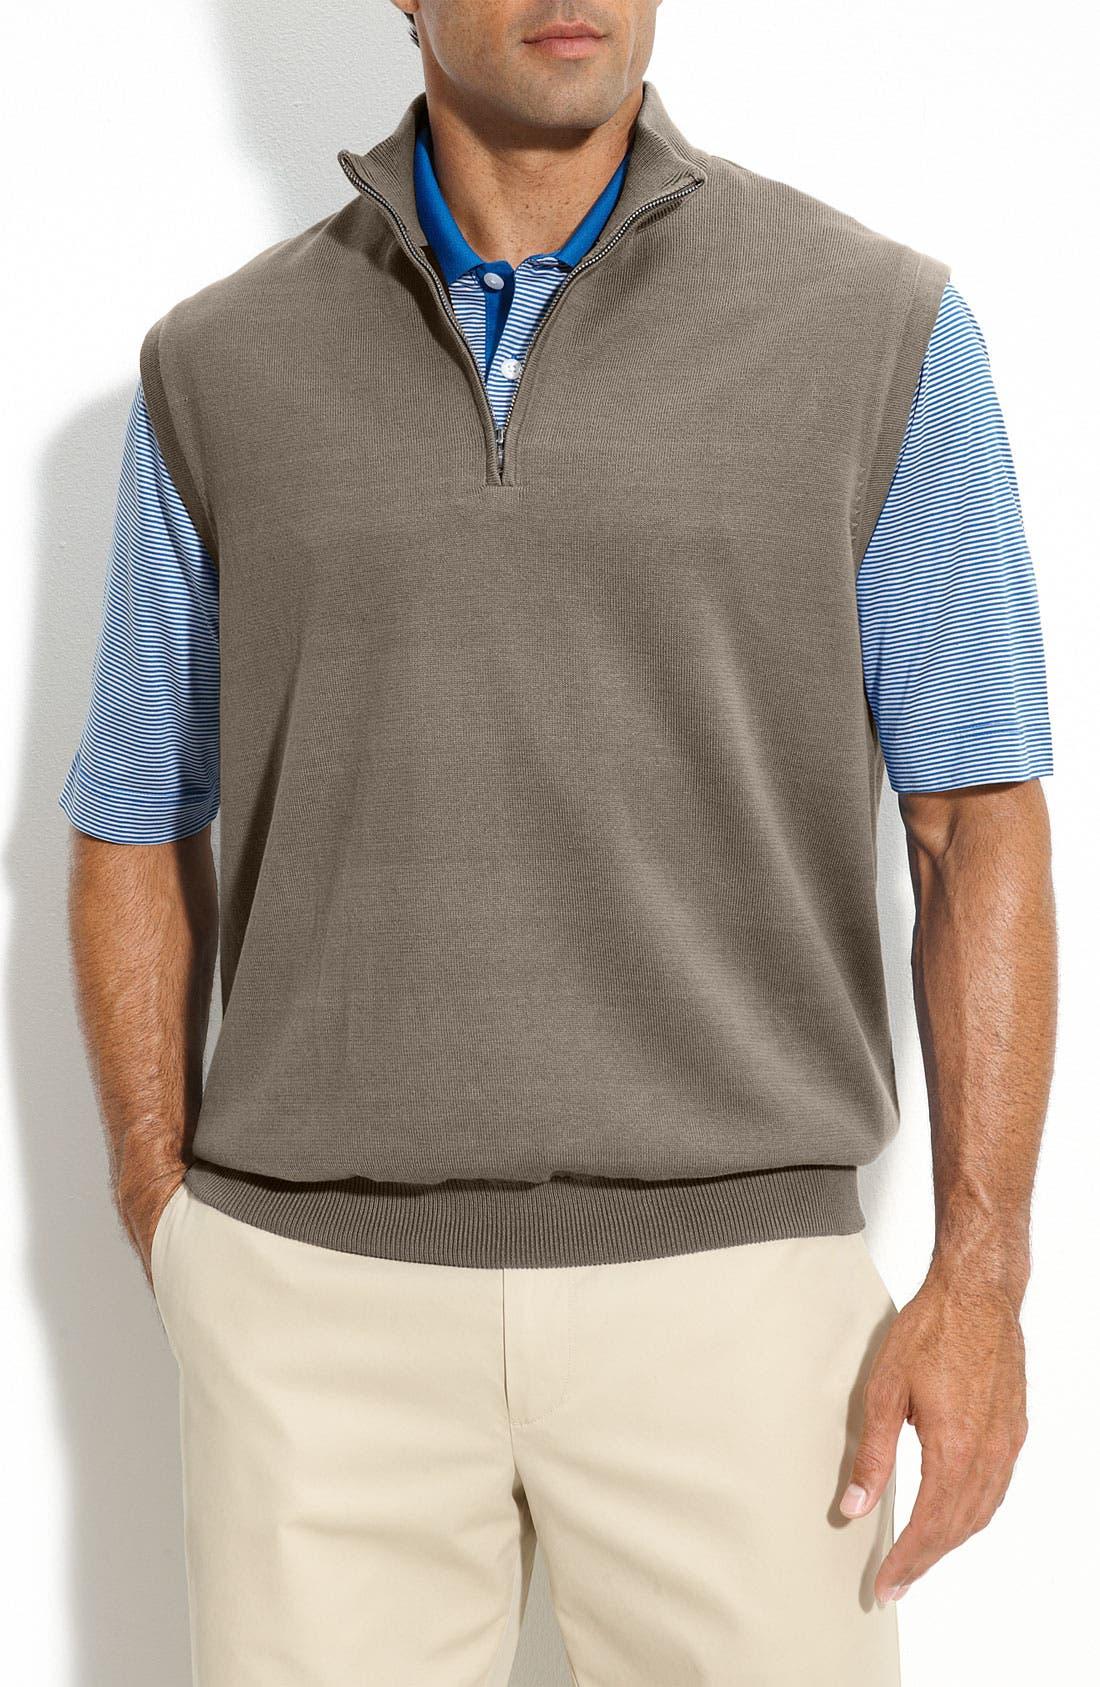 Main Image - Cutter & Buck 'Sandpoint' Half Zip Golf Vest